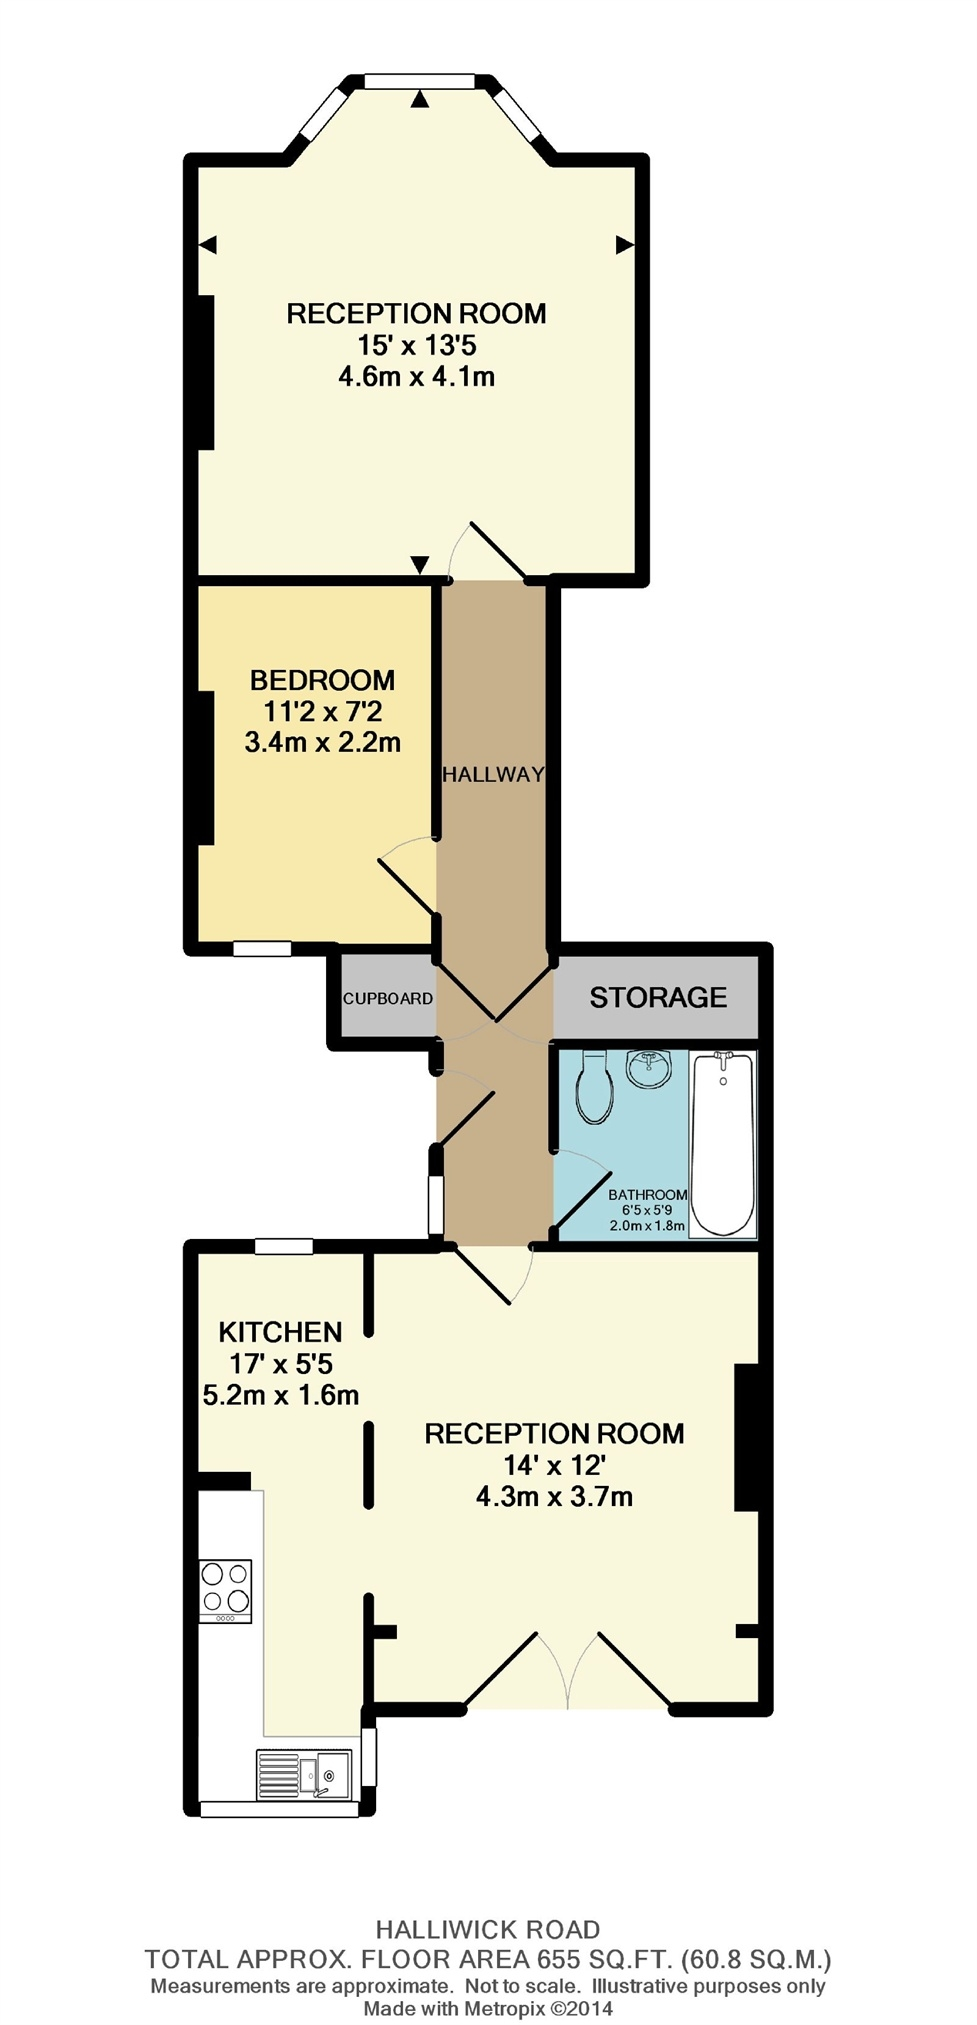 Halliwick Road Muswell Hill London N10 2 Bedroom Flat